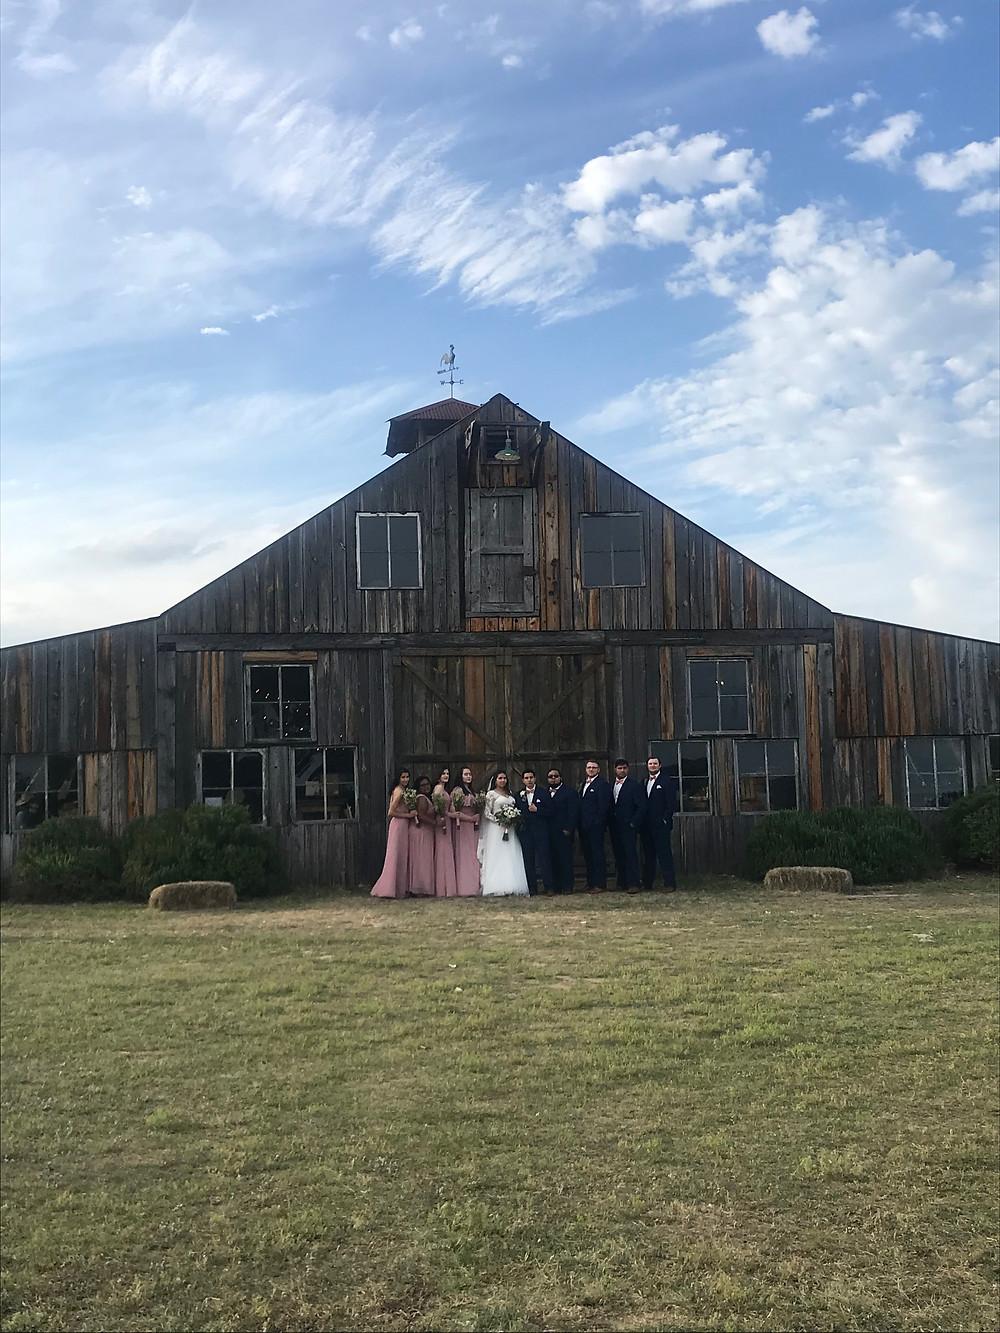 Wedding at the 1850 Settlement